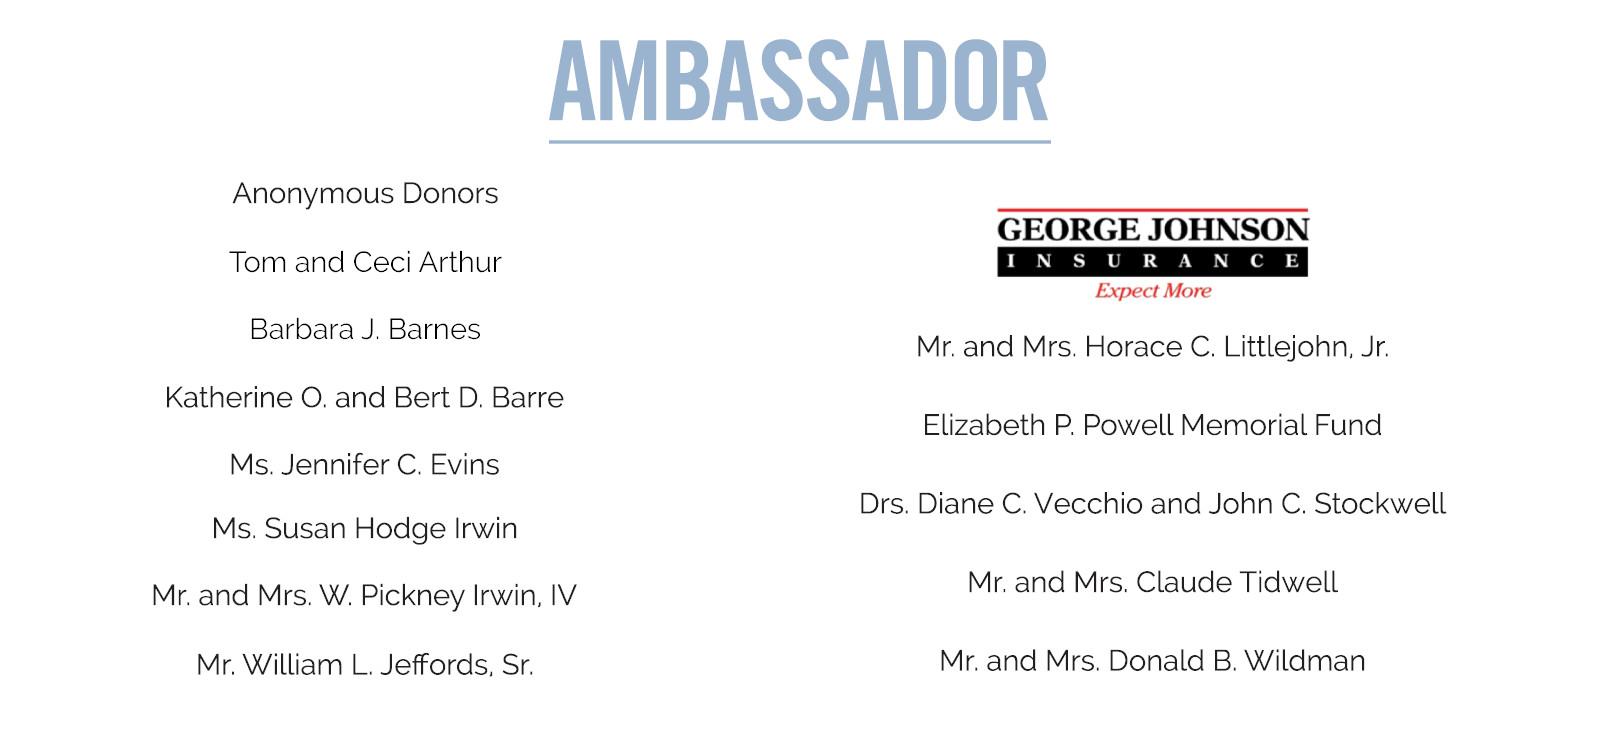 Ambassador Sponsorship